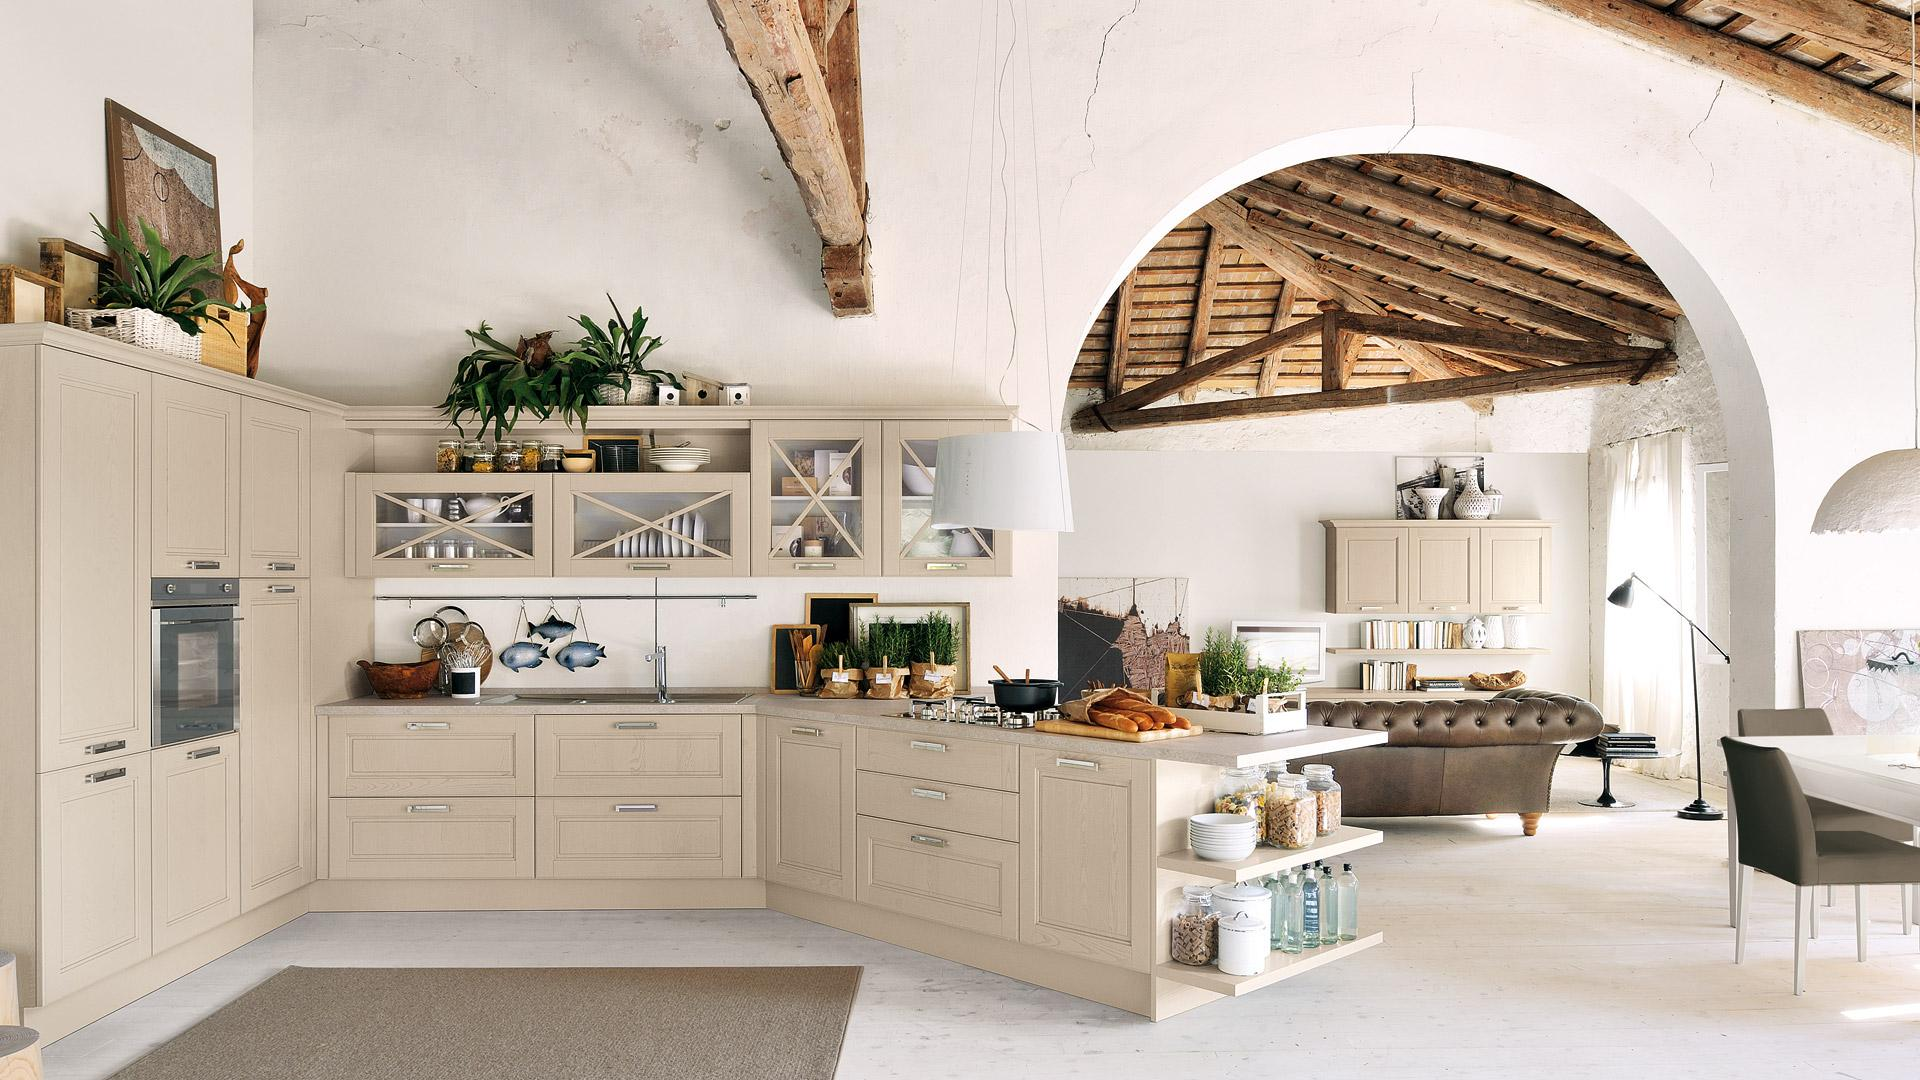 Best Magri Arreda Cucine Ideas - Design & Ideas 2017 - candp.us